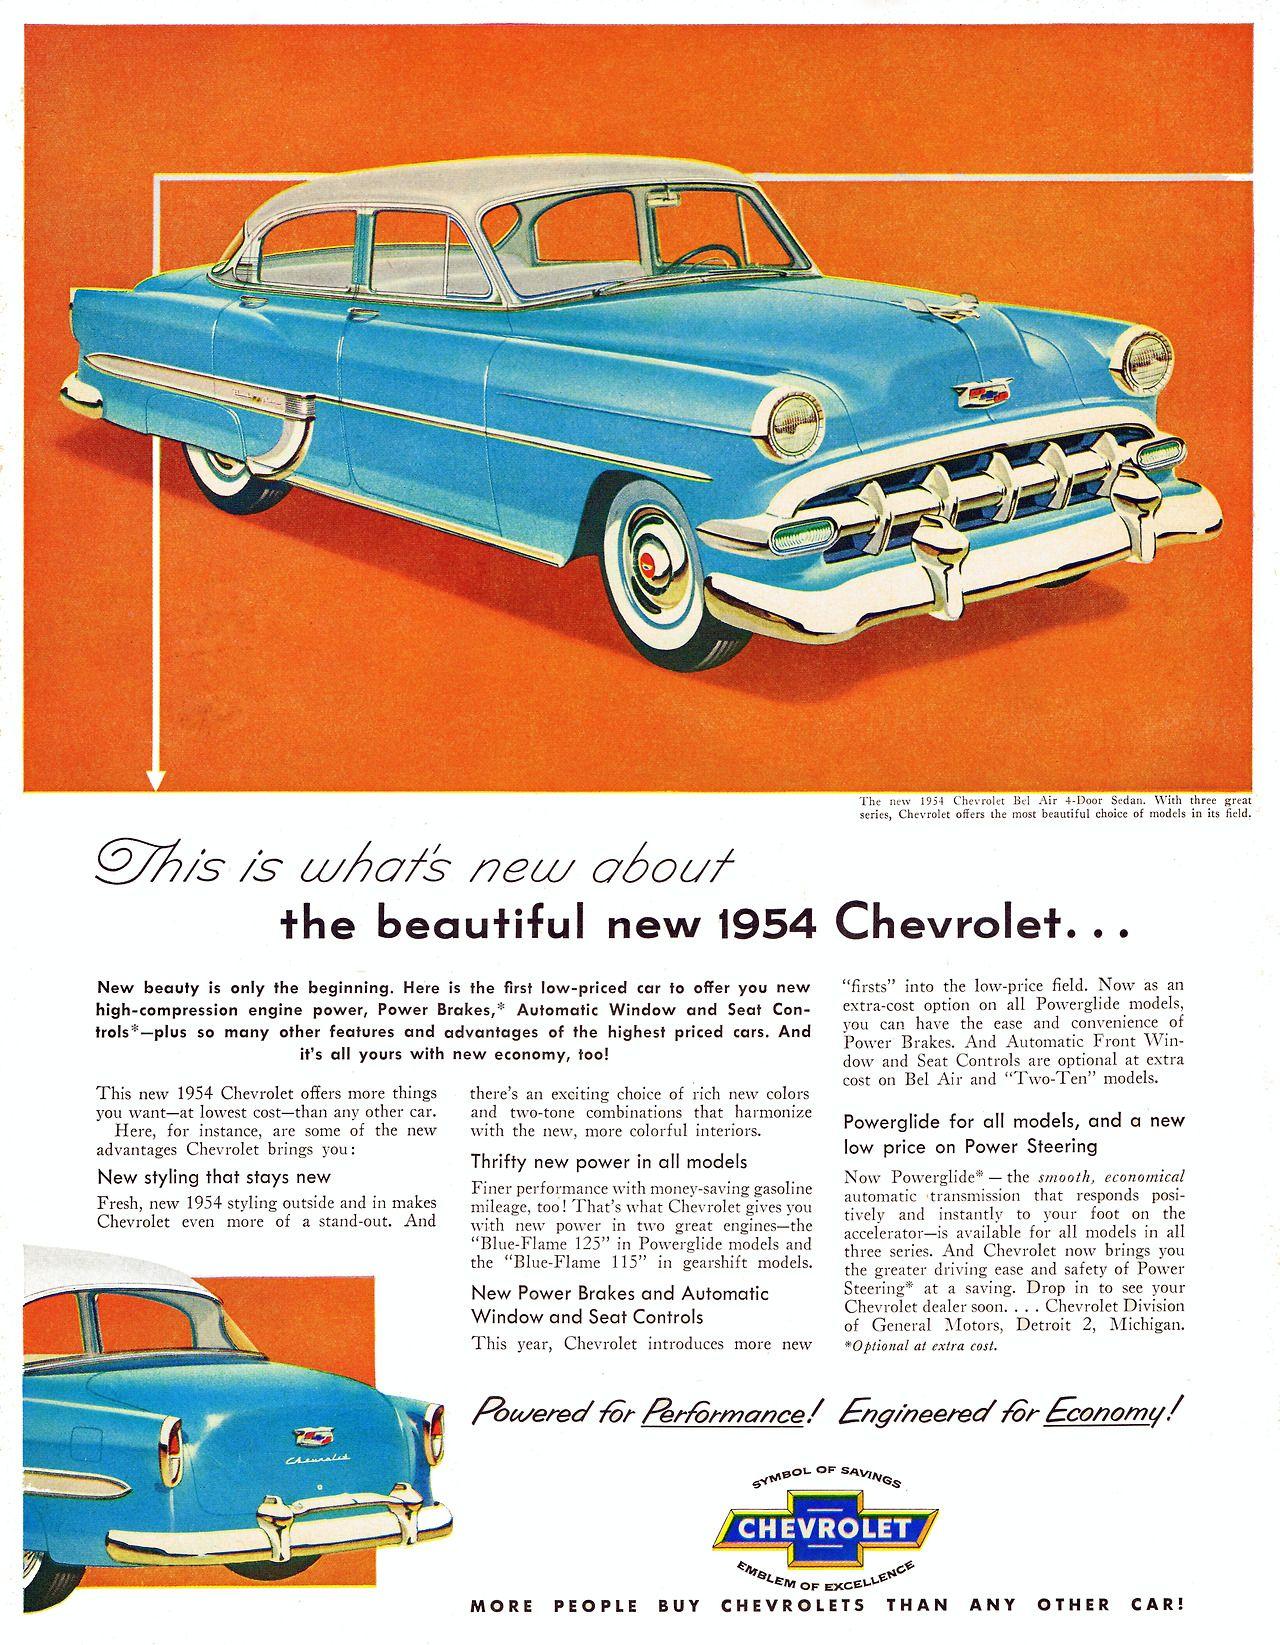 Chevrolet Bel Air, 1954 Chevrolet bel air